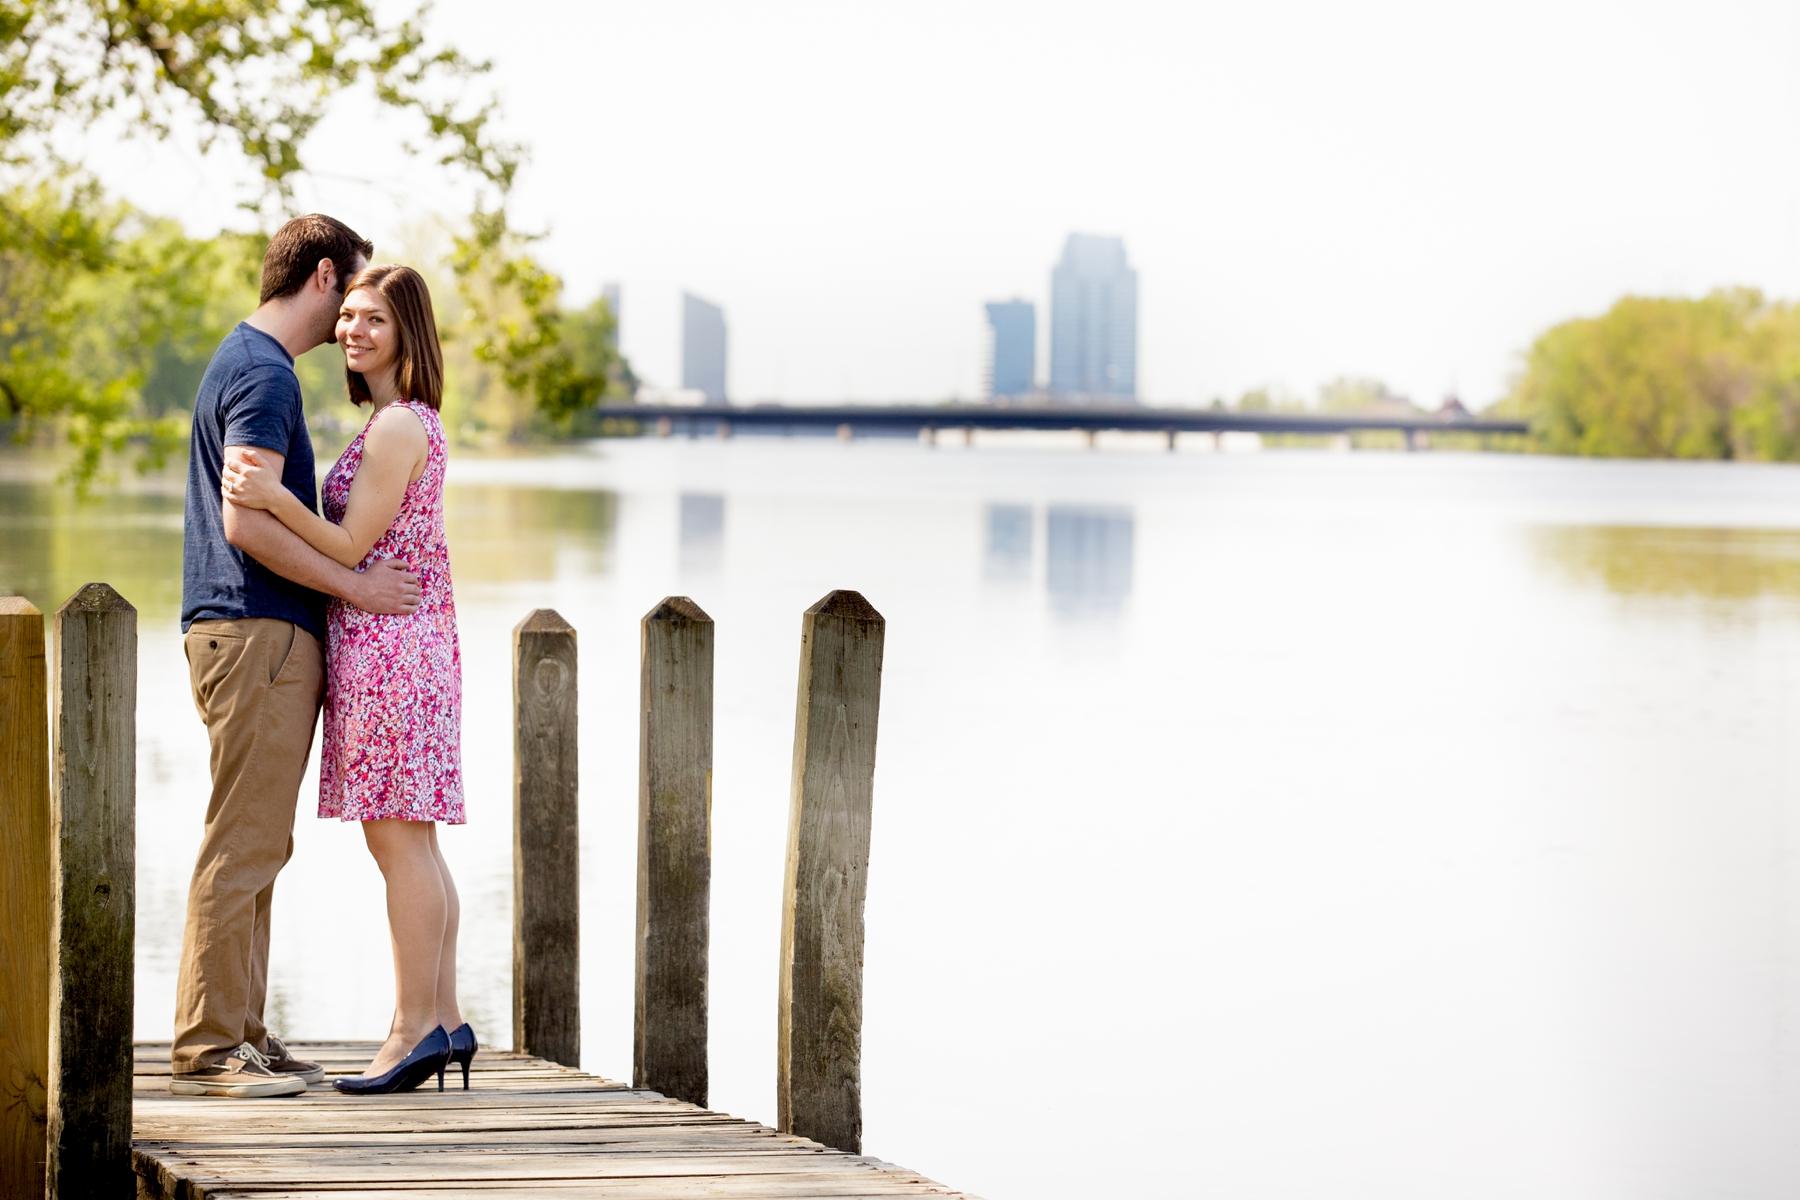 Brandon_Shafer_Photography_Michele_Chris_Michigan_Grand_Rapids_City_Engagement_0016.jpg